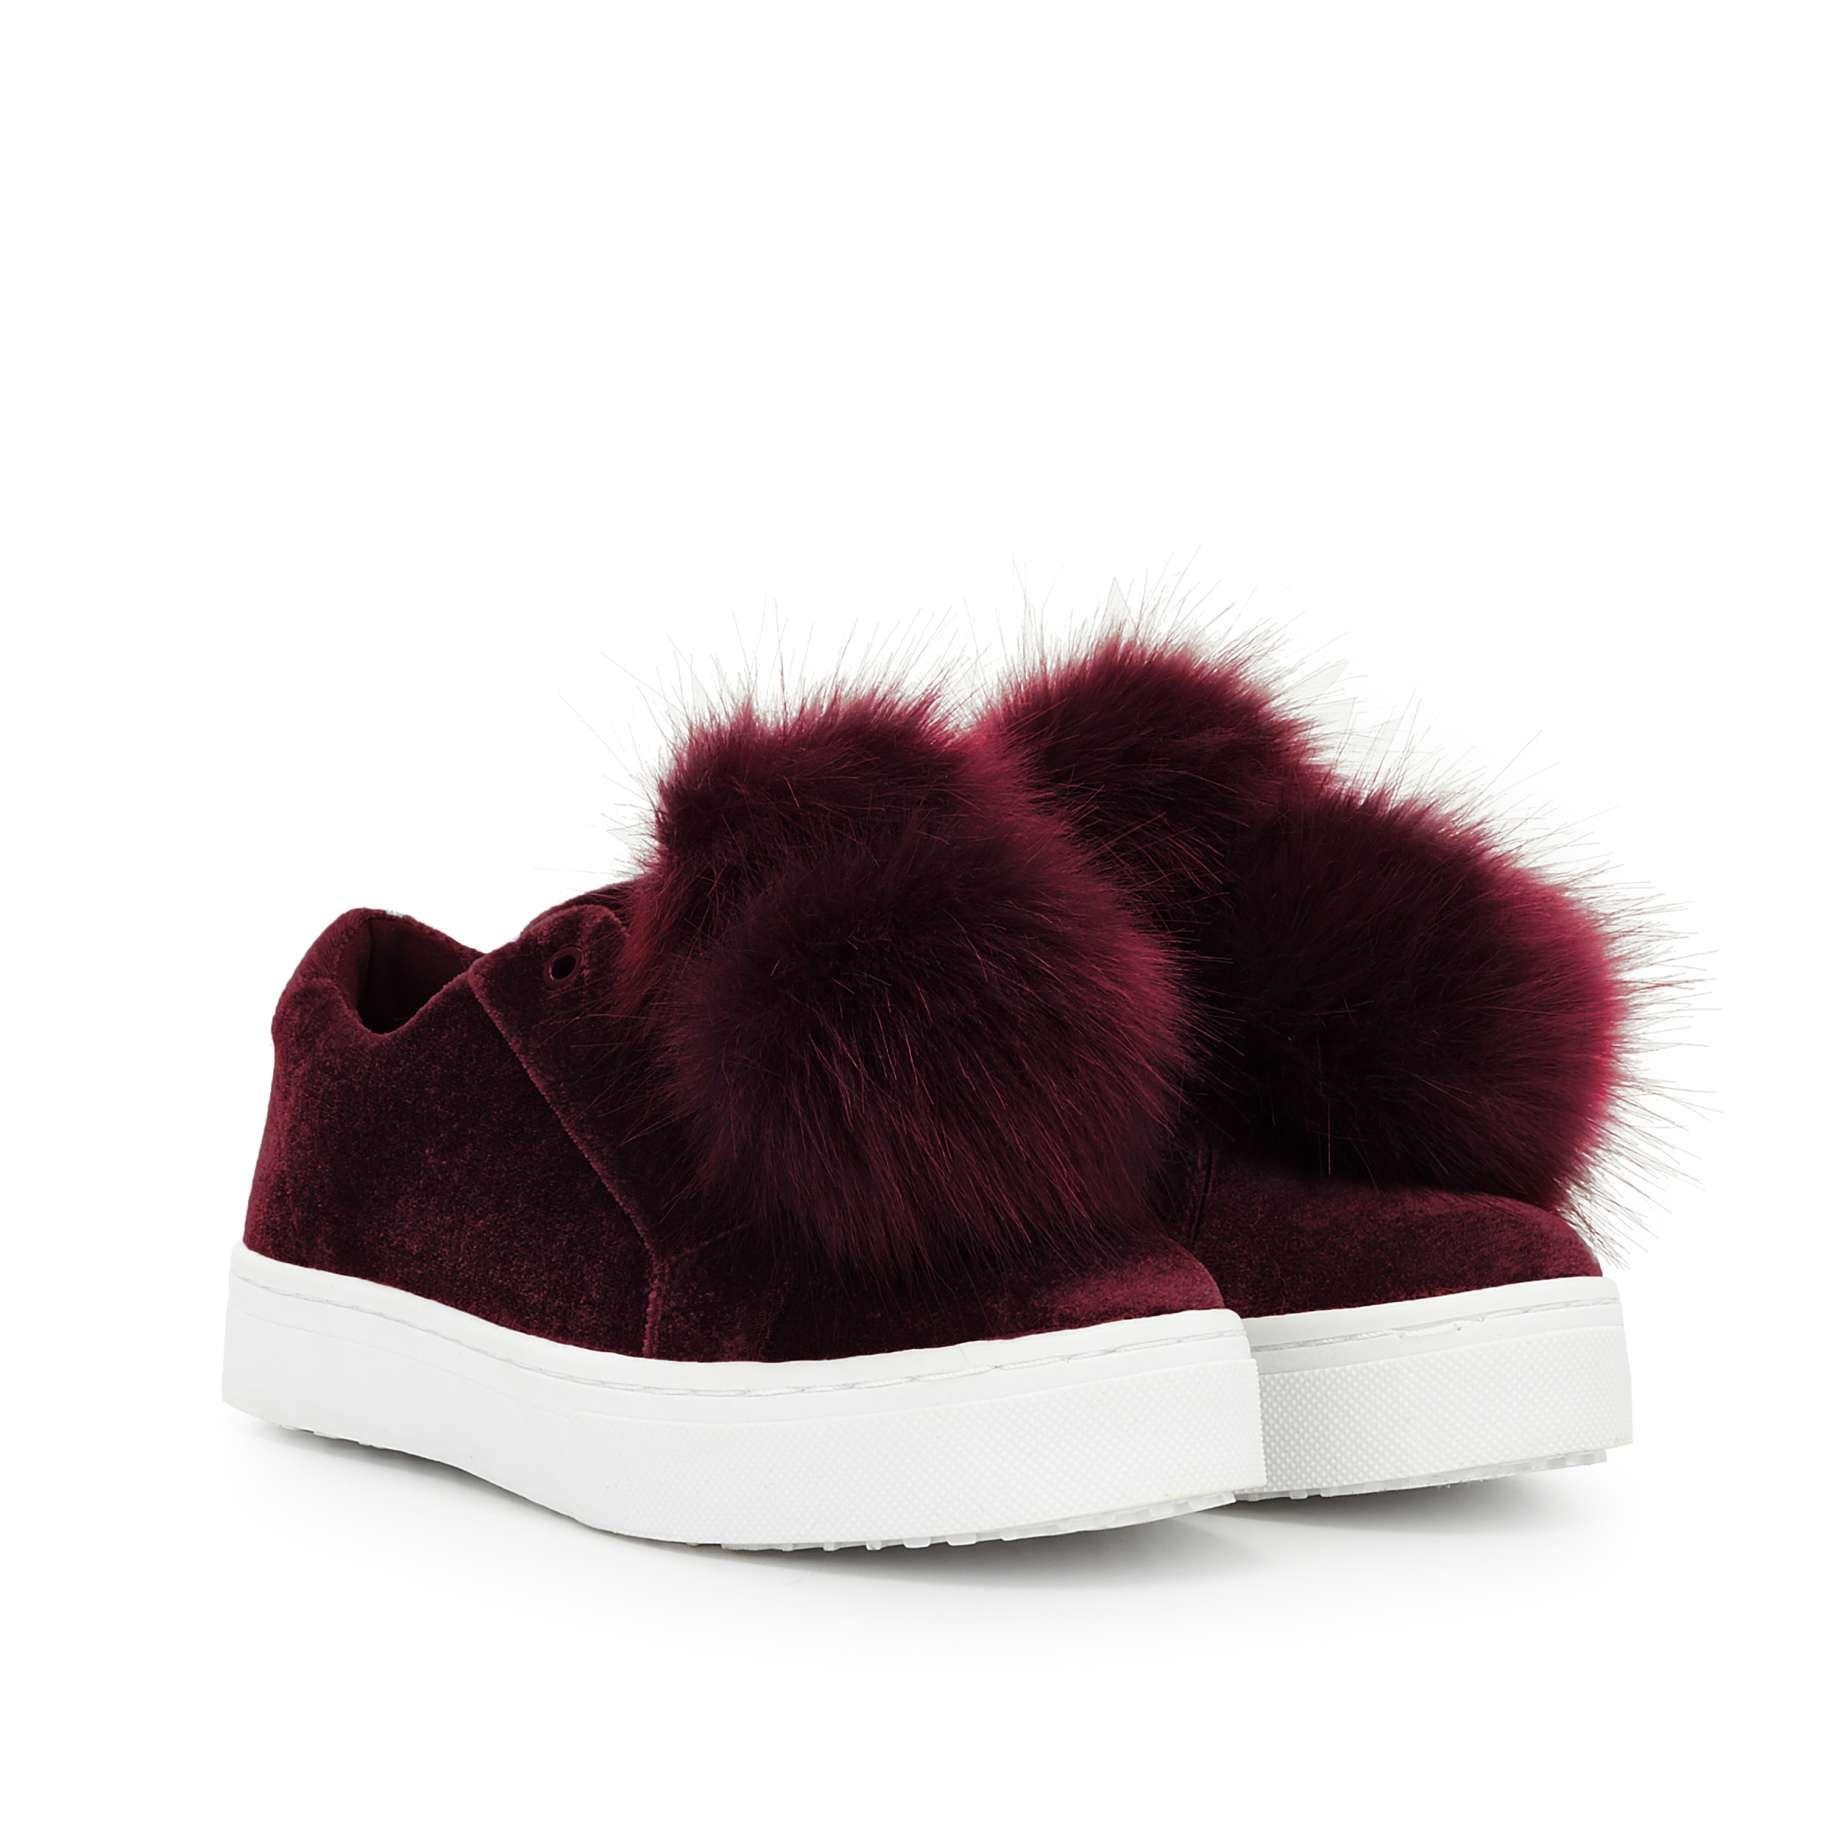 b7d65dbf4fd3 Leya Velvet Fur Sneaker Shoe by Sam Edelman - - View 1